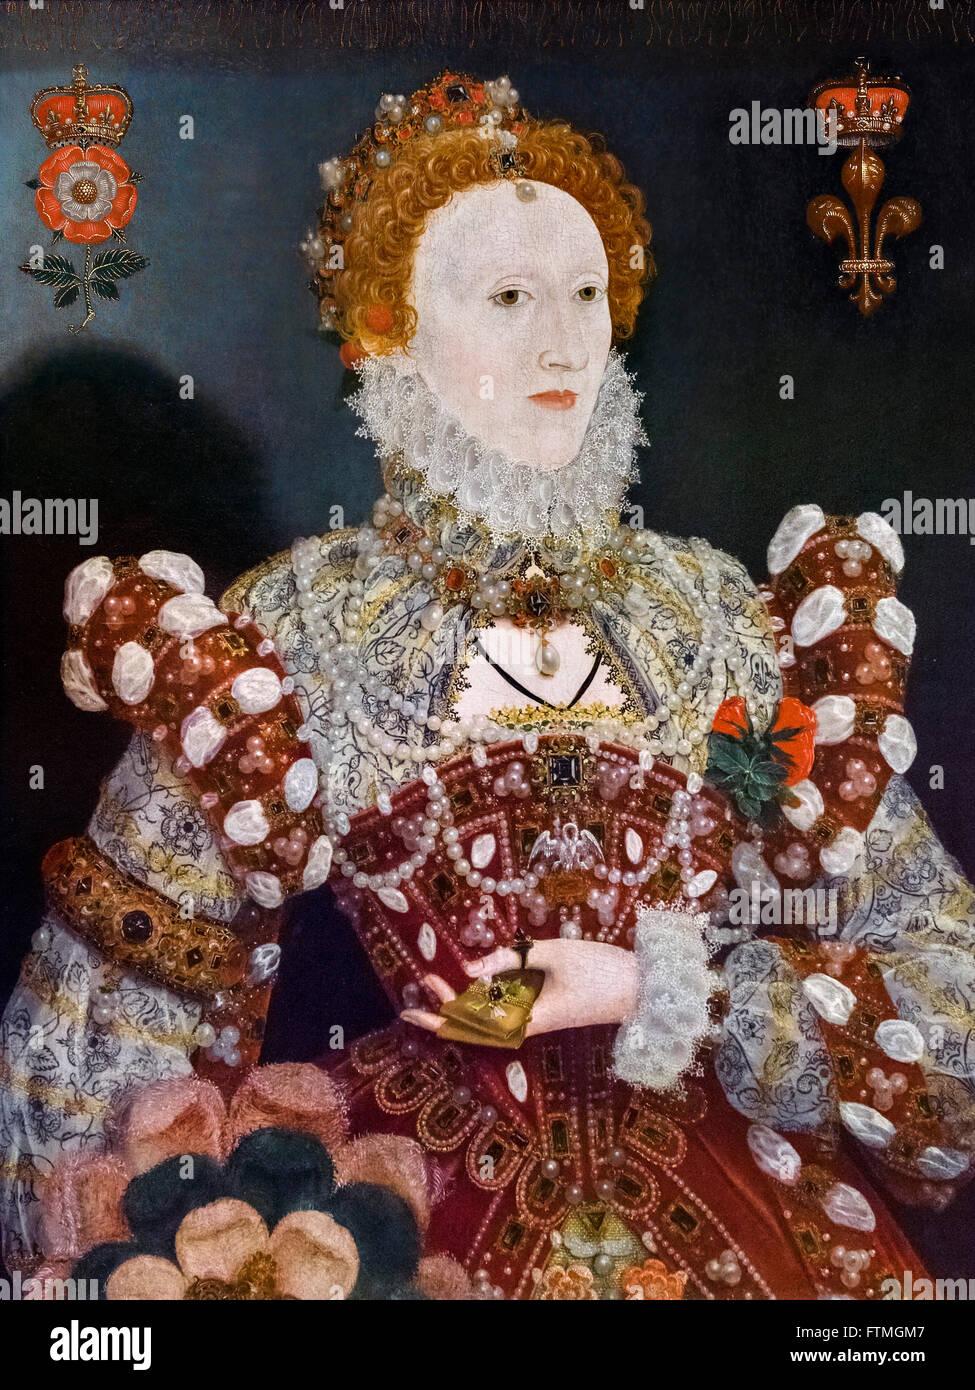 Queen Elizabeth I by Nicholas Hilliard c 1573 - Stock Image